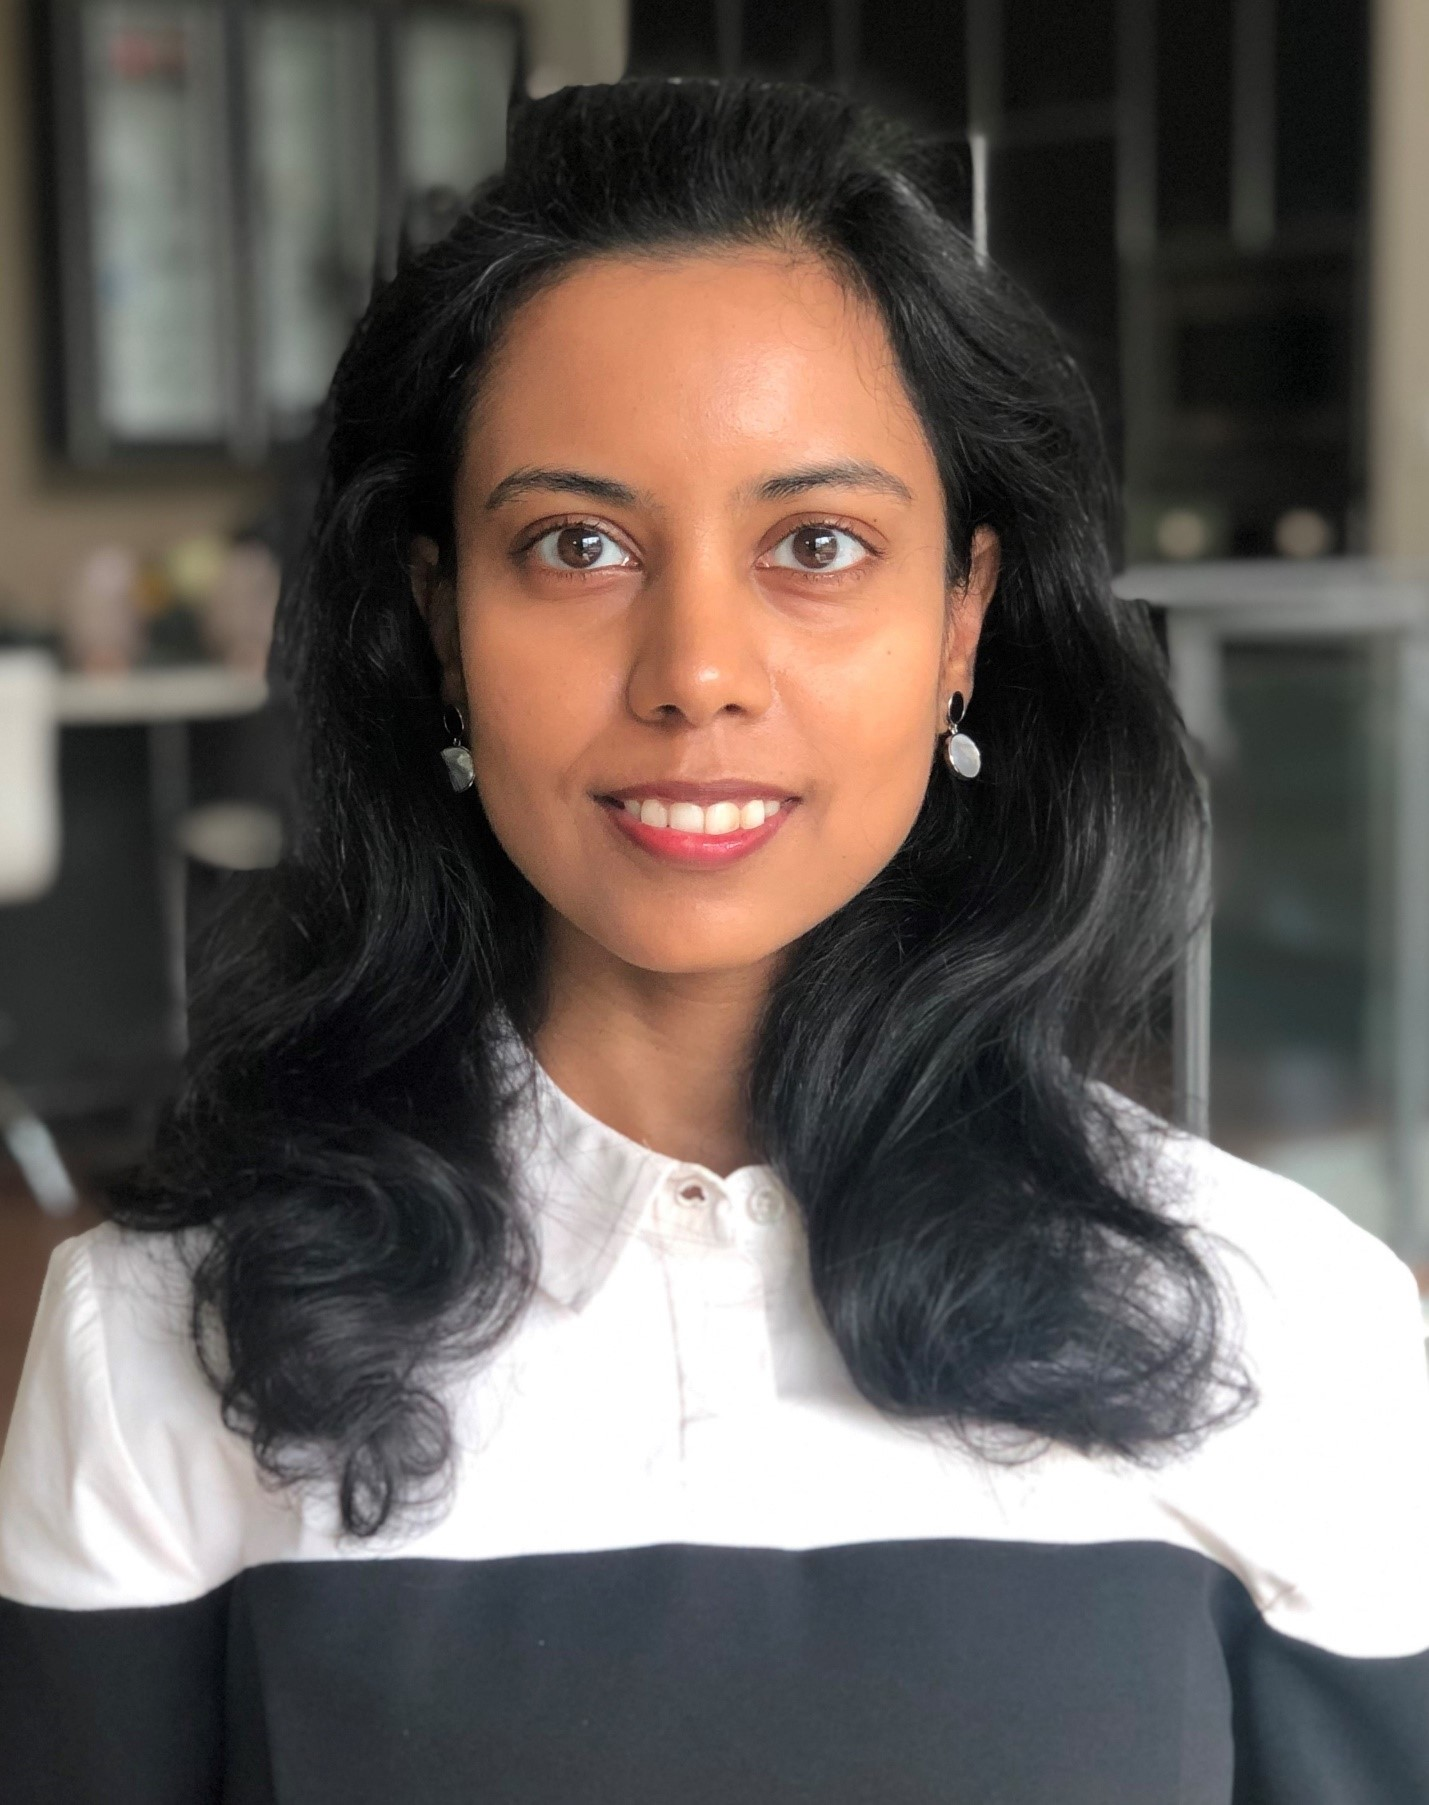 Dr. Ranjita Ghose